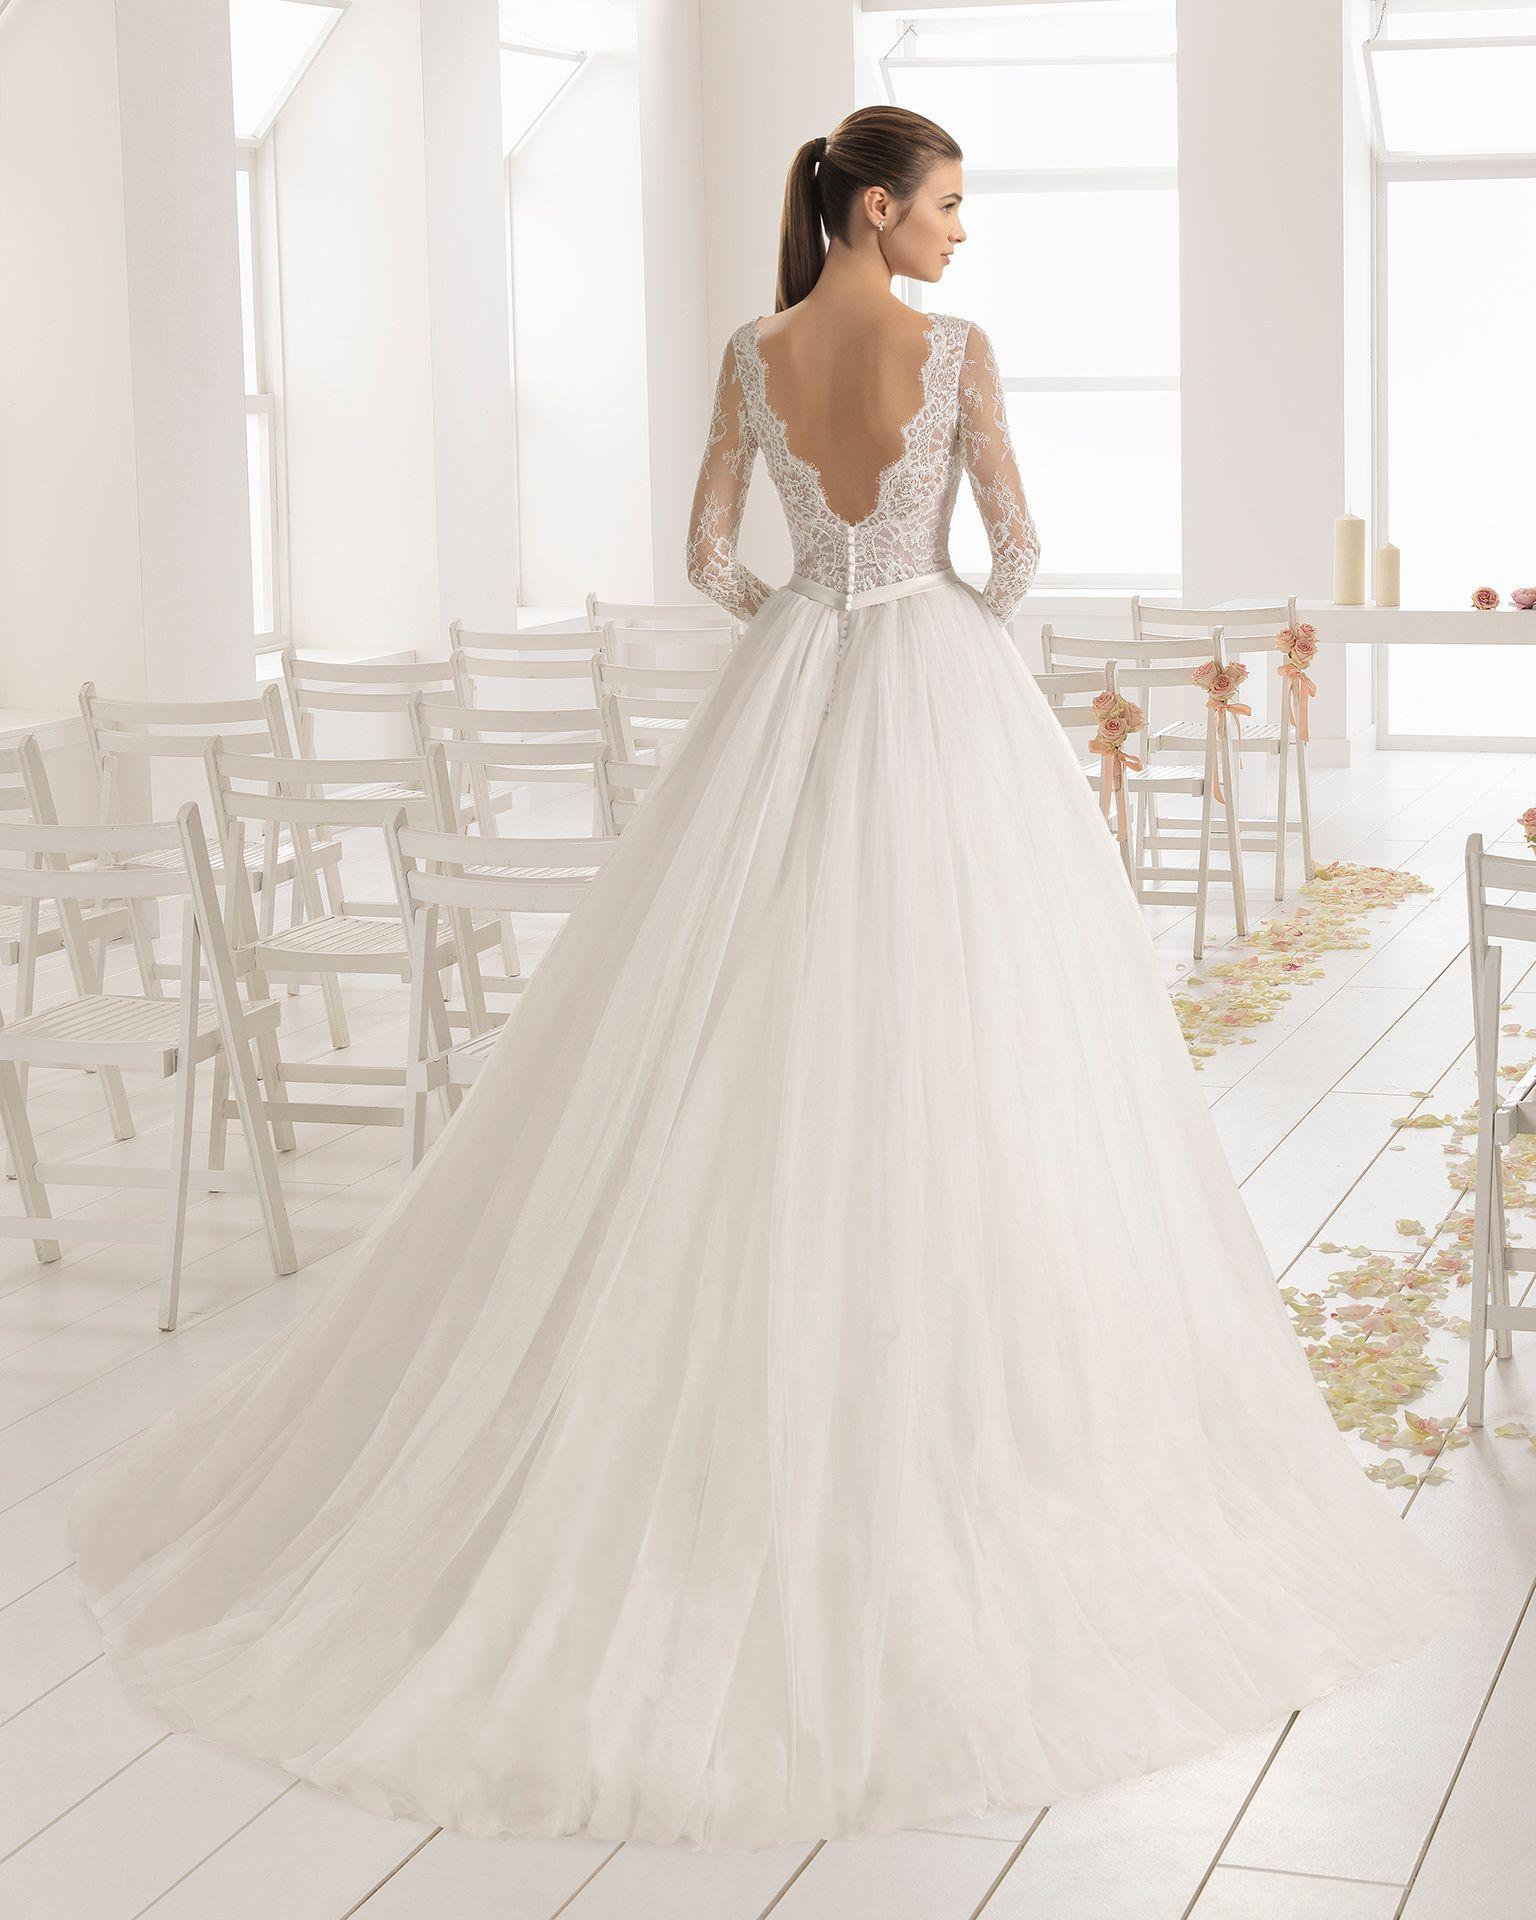 eb6003e31e Vestido de novia estilo línea A en encaje y tul con manga larga con escote  barco y espalda V.